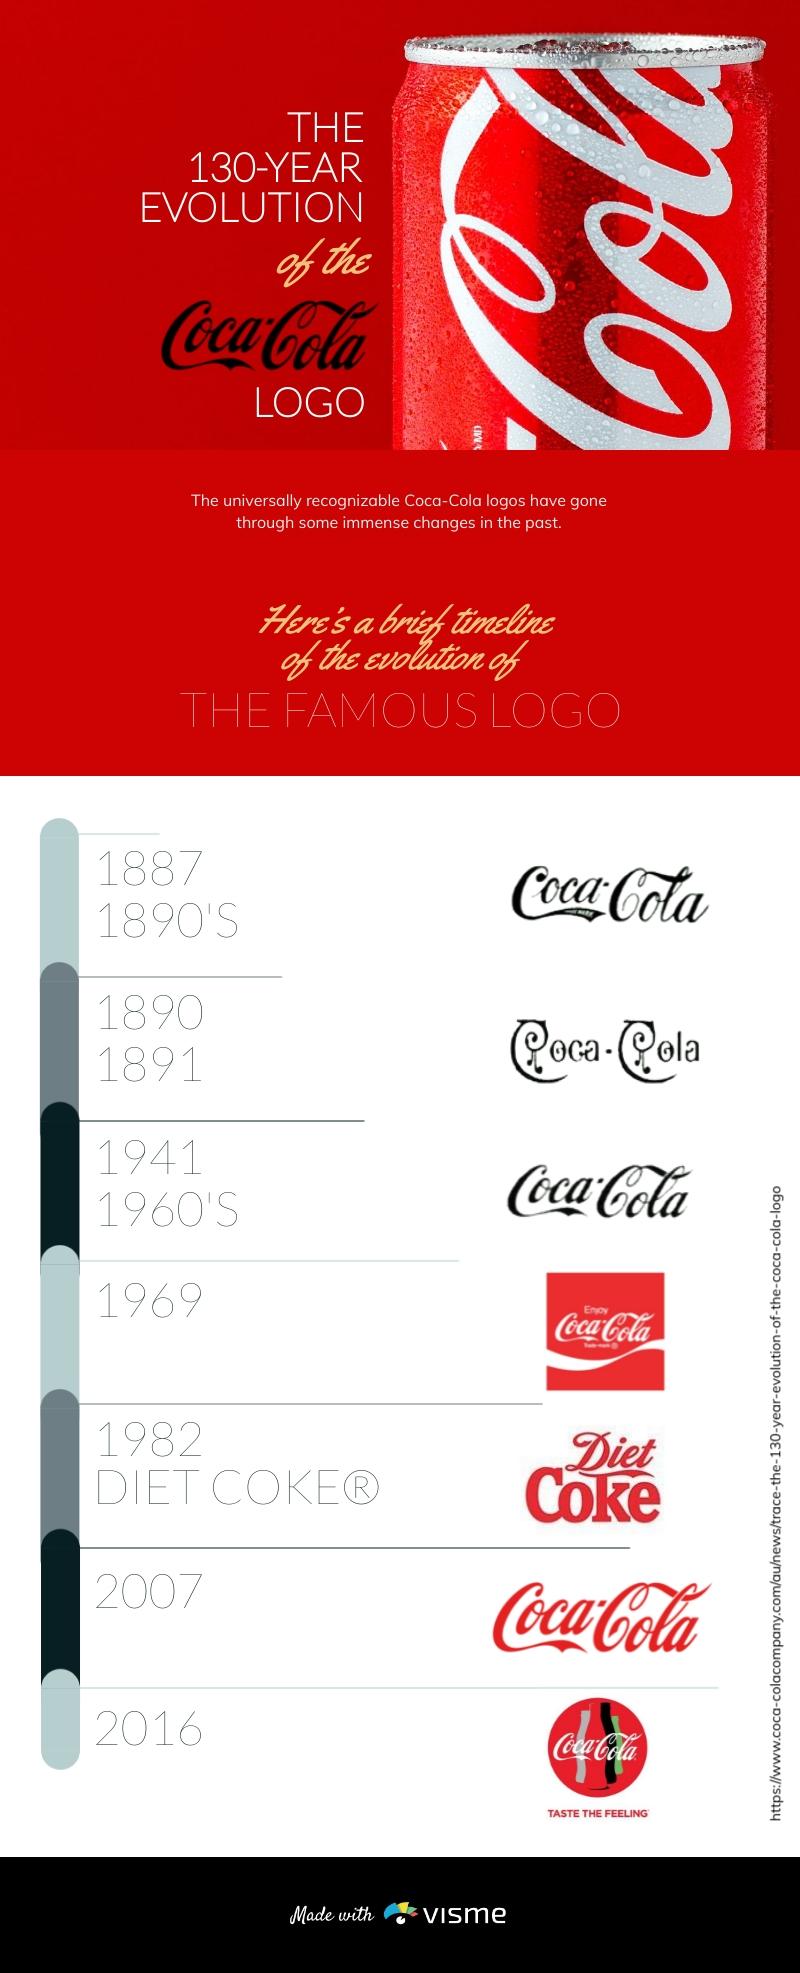 Coca Cola Logo Evolution Timeline Infographic Template